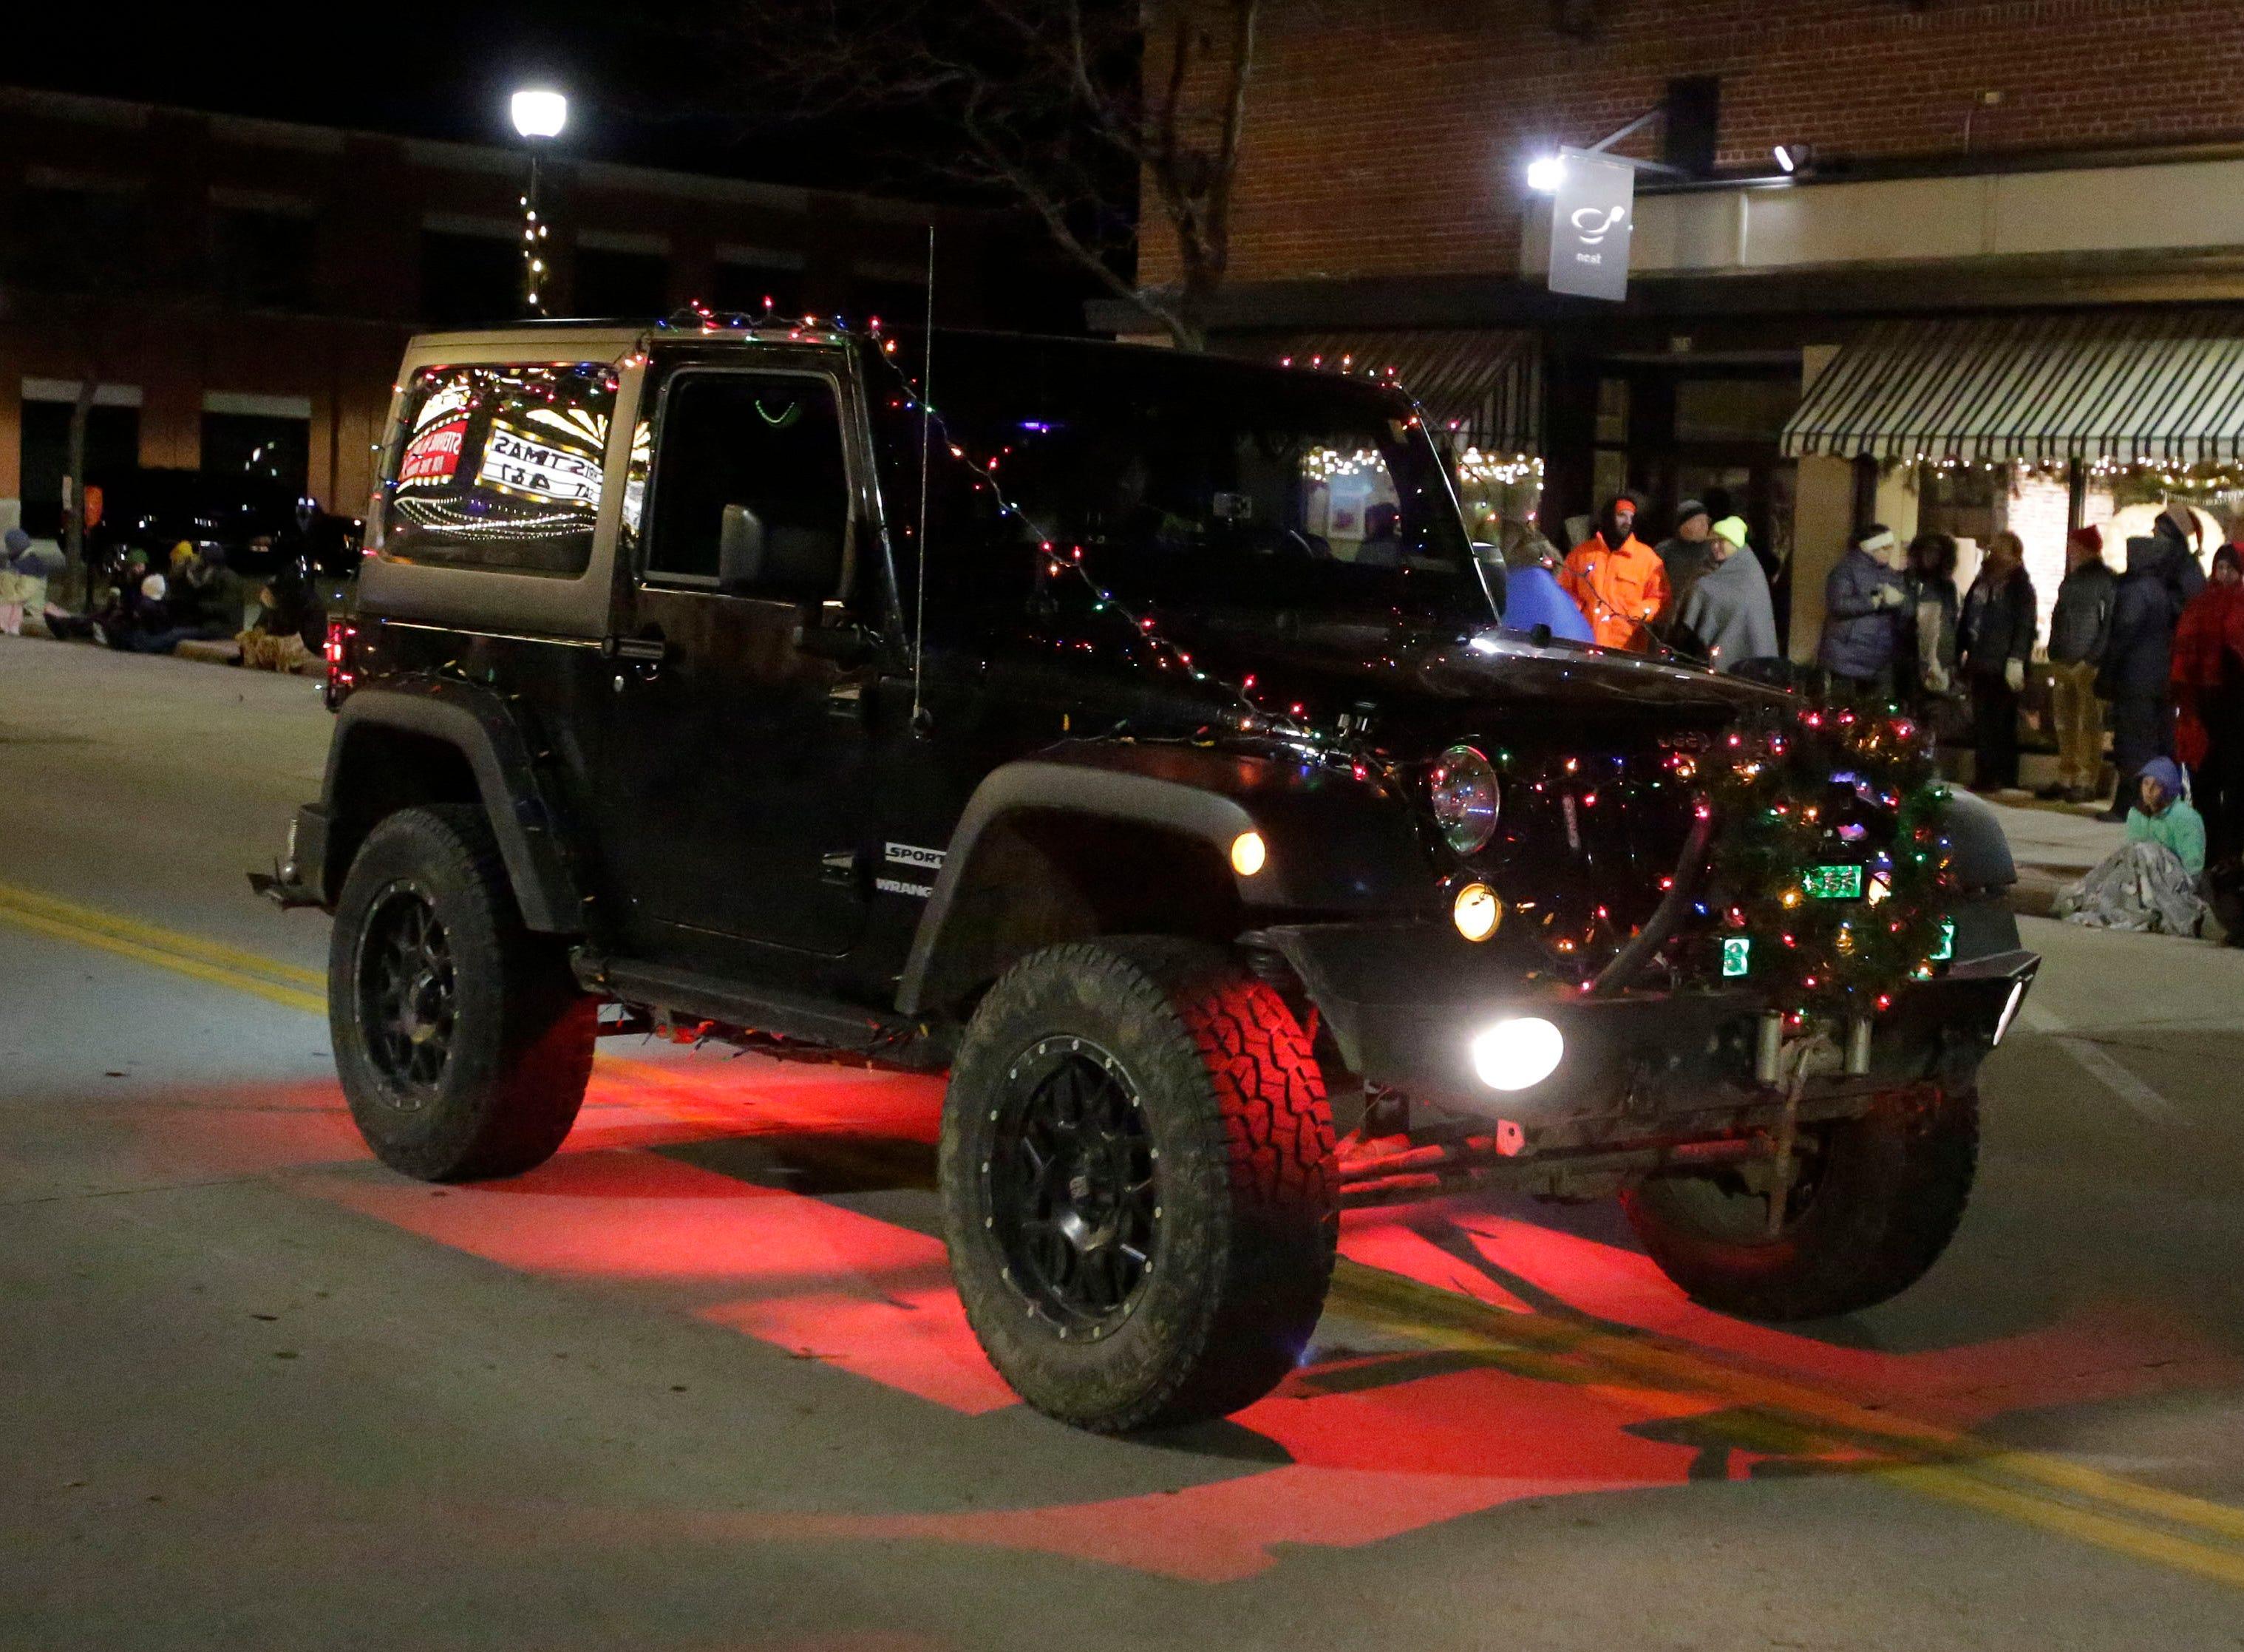 A Jeep glows North 8th Street at the 26th Annual Jaycees Holiday Parade, Sunday, November 25, 2018 in Sheboygan, Wis.